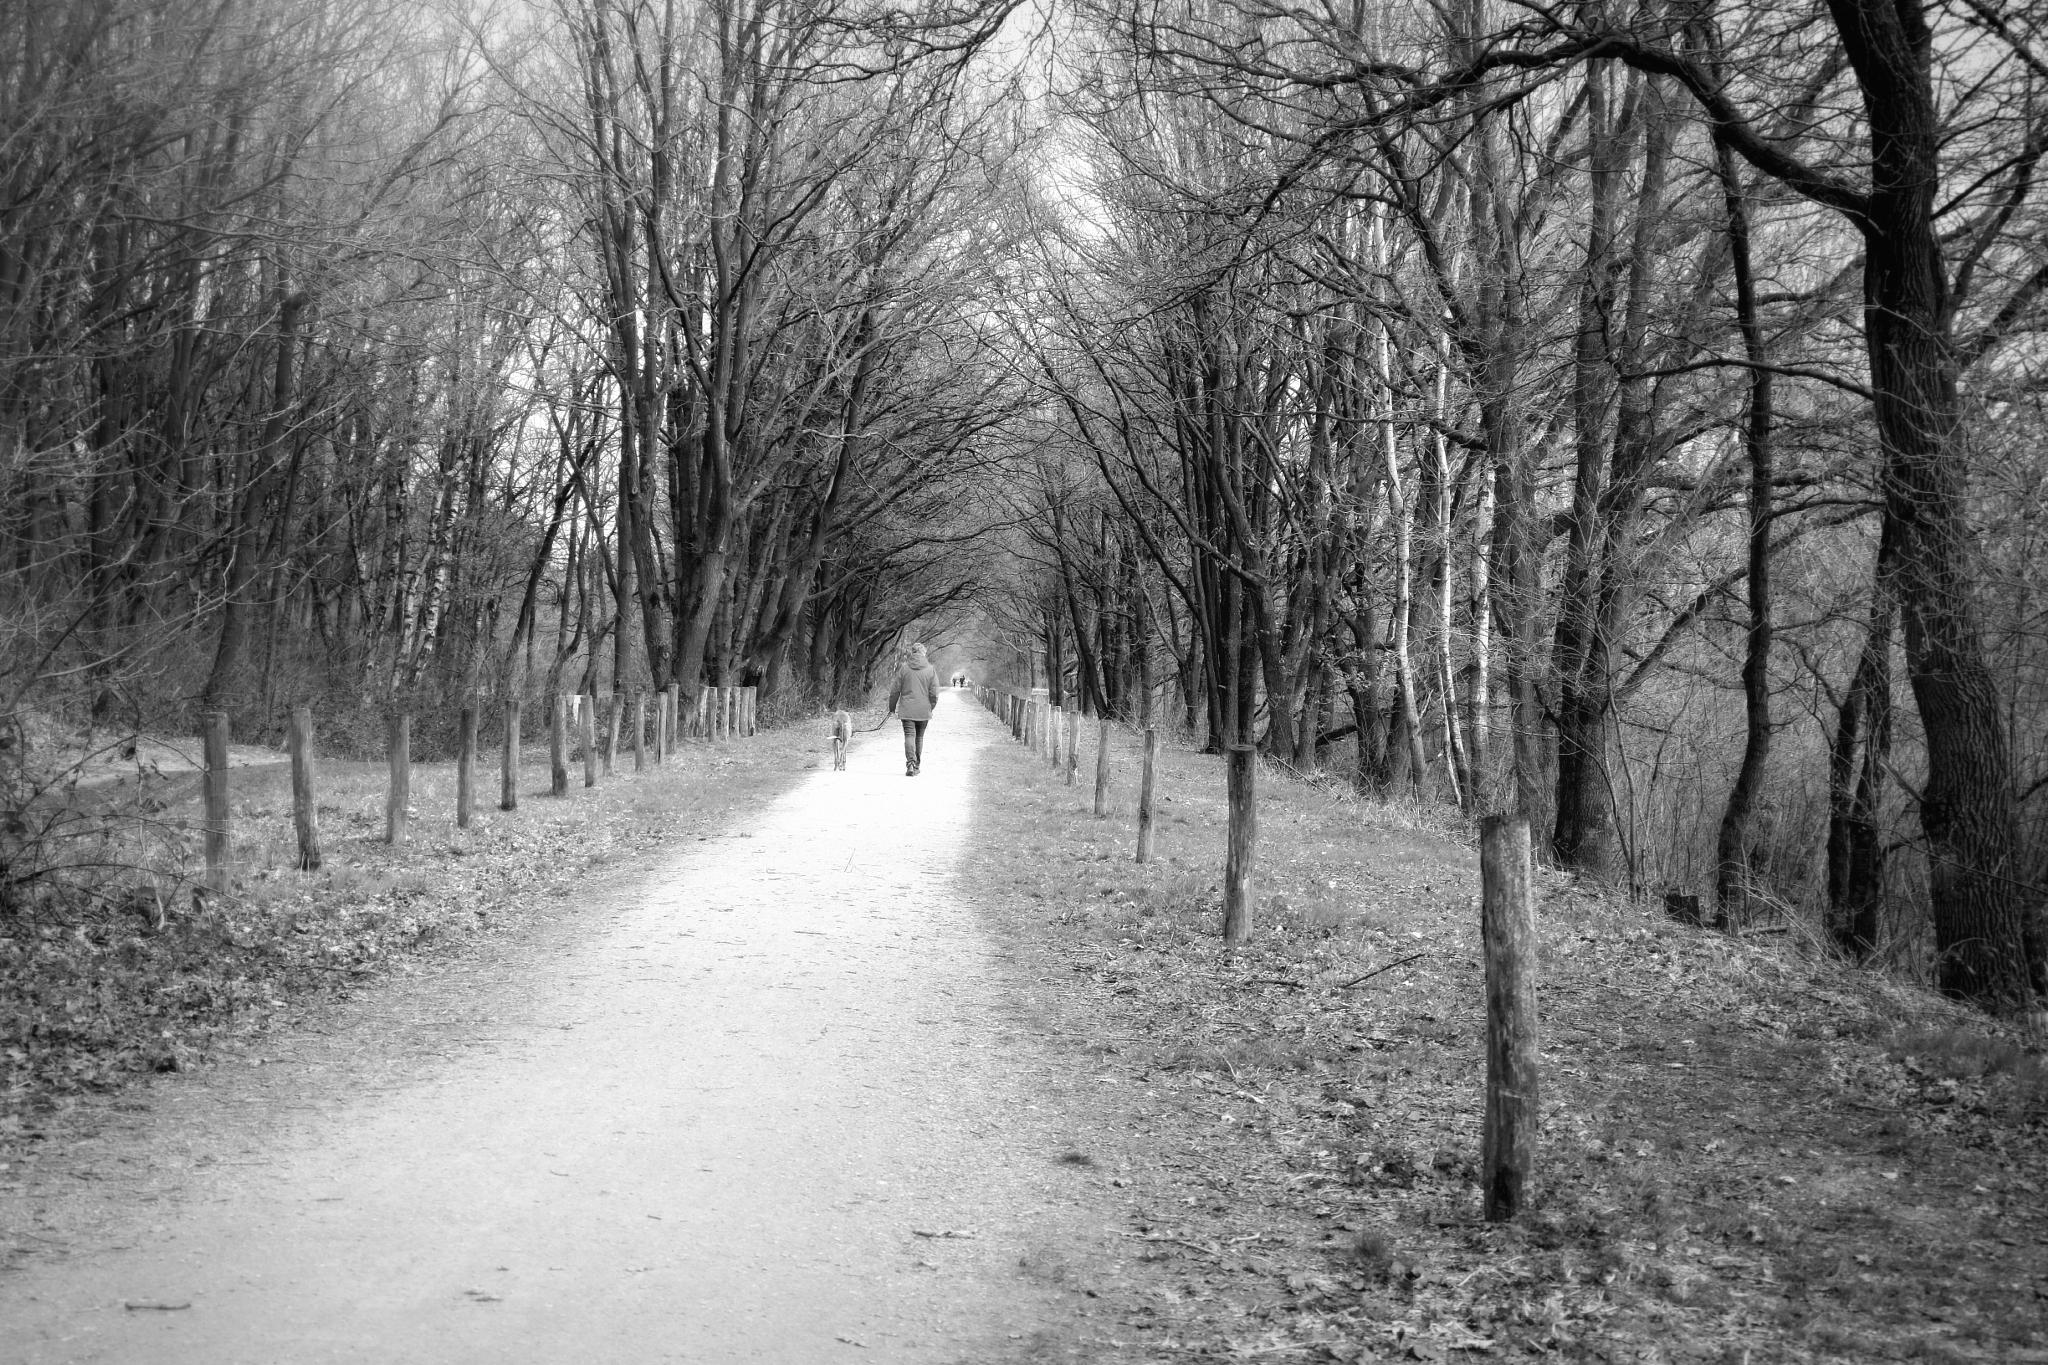 Walking the dog by jos.vanooijen.92